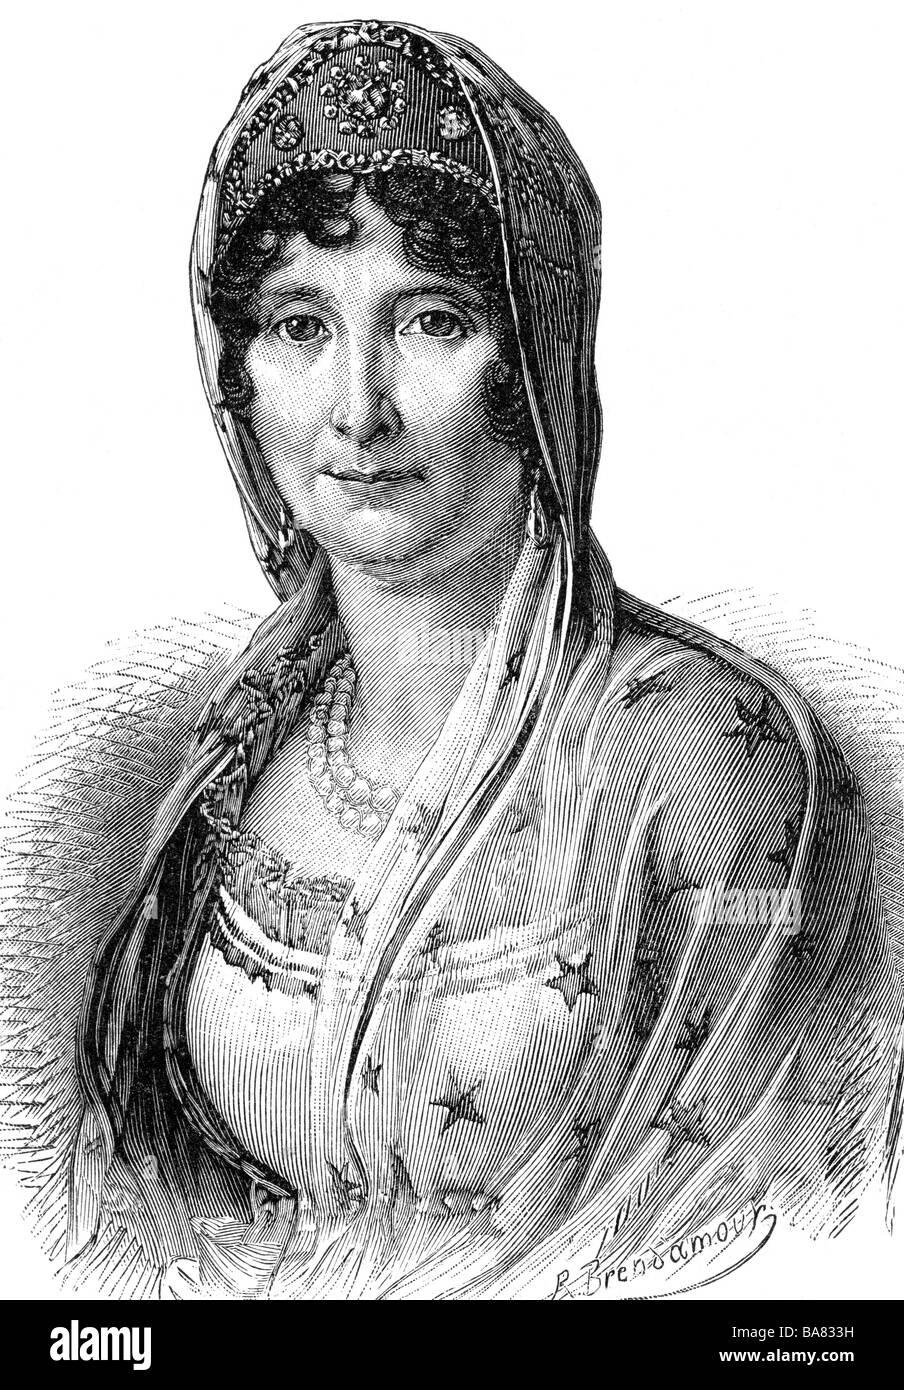 Buonaparte, Laetizia, 24.8.1750 - 2.5.1836, Corsican noblewoman, portrait, wood engraving, 19th century, , Stock Photo